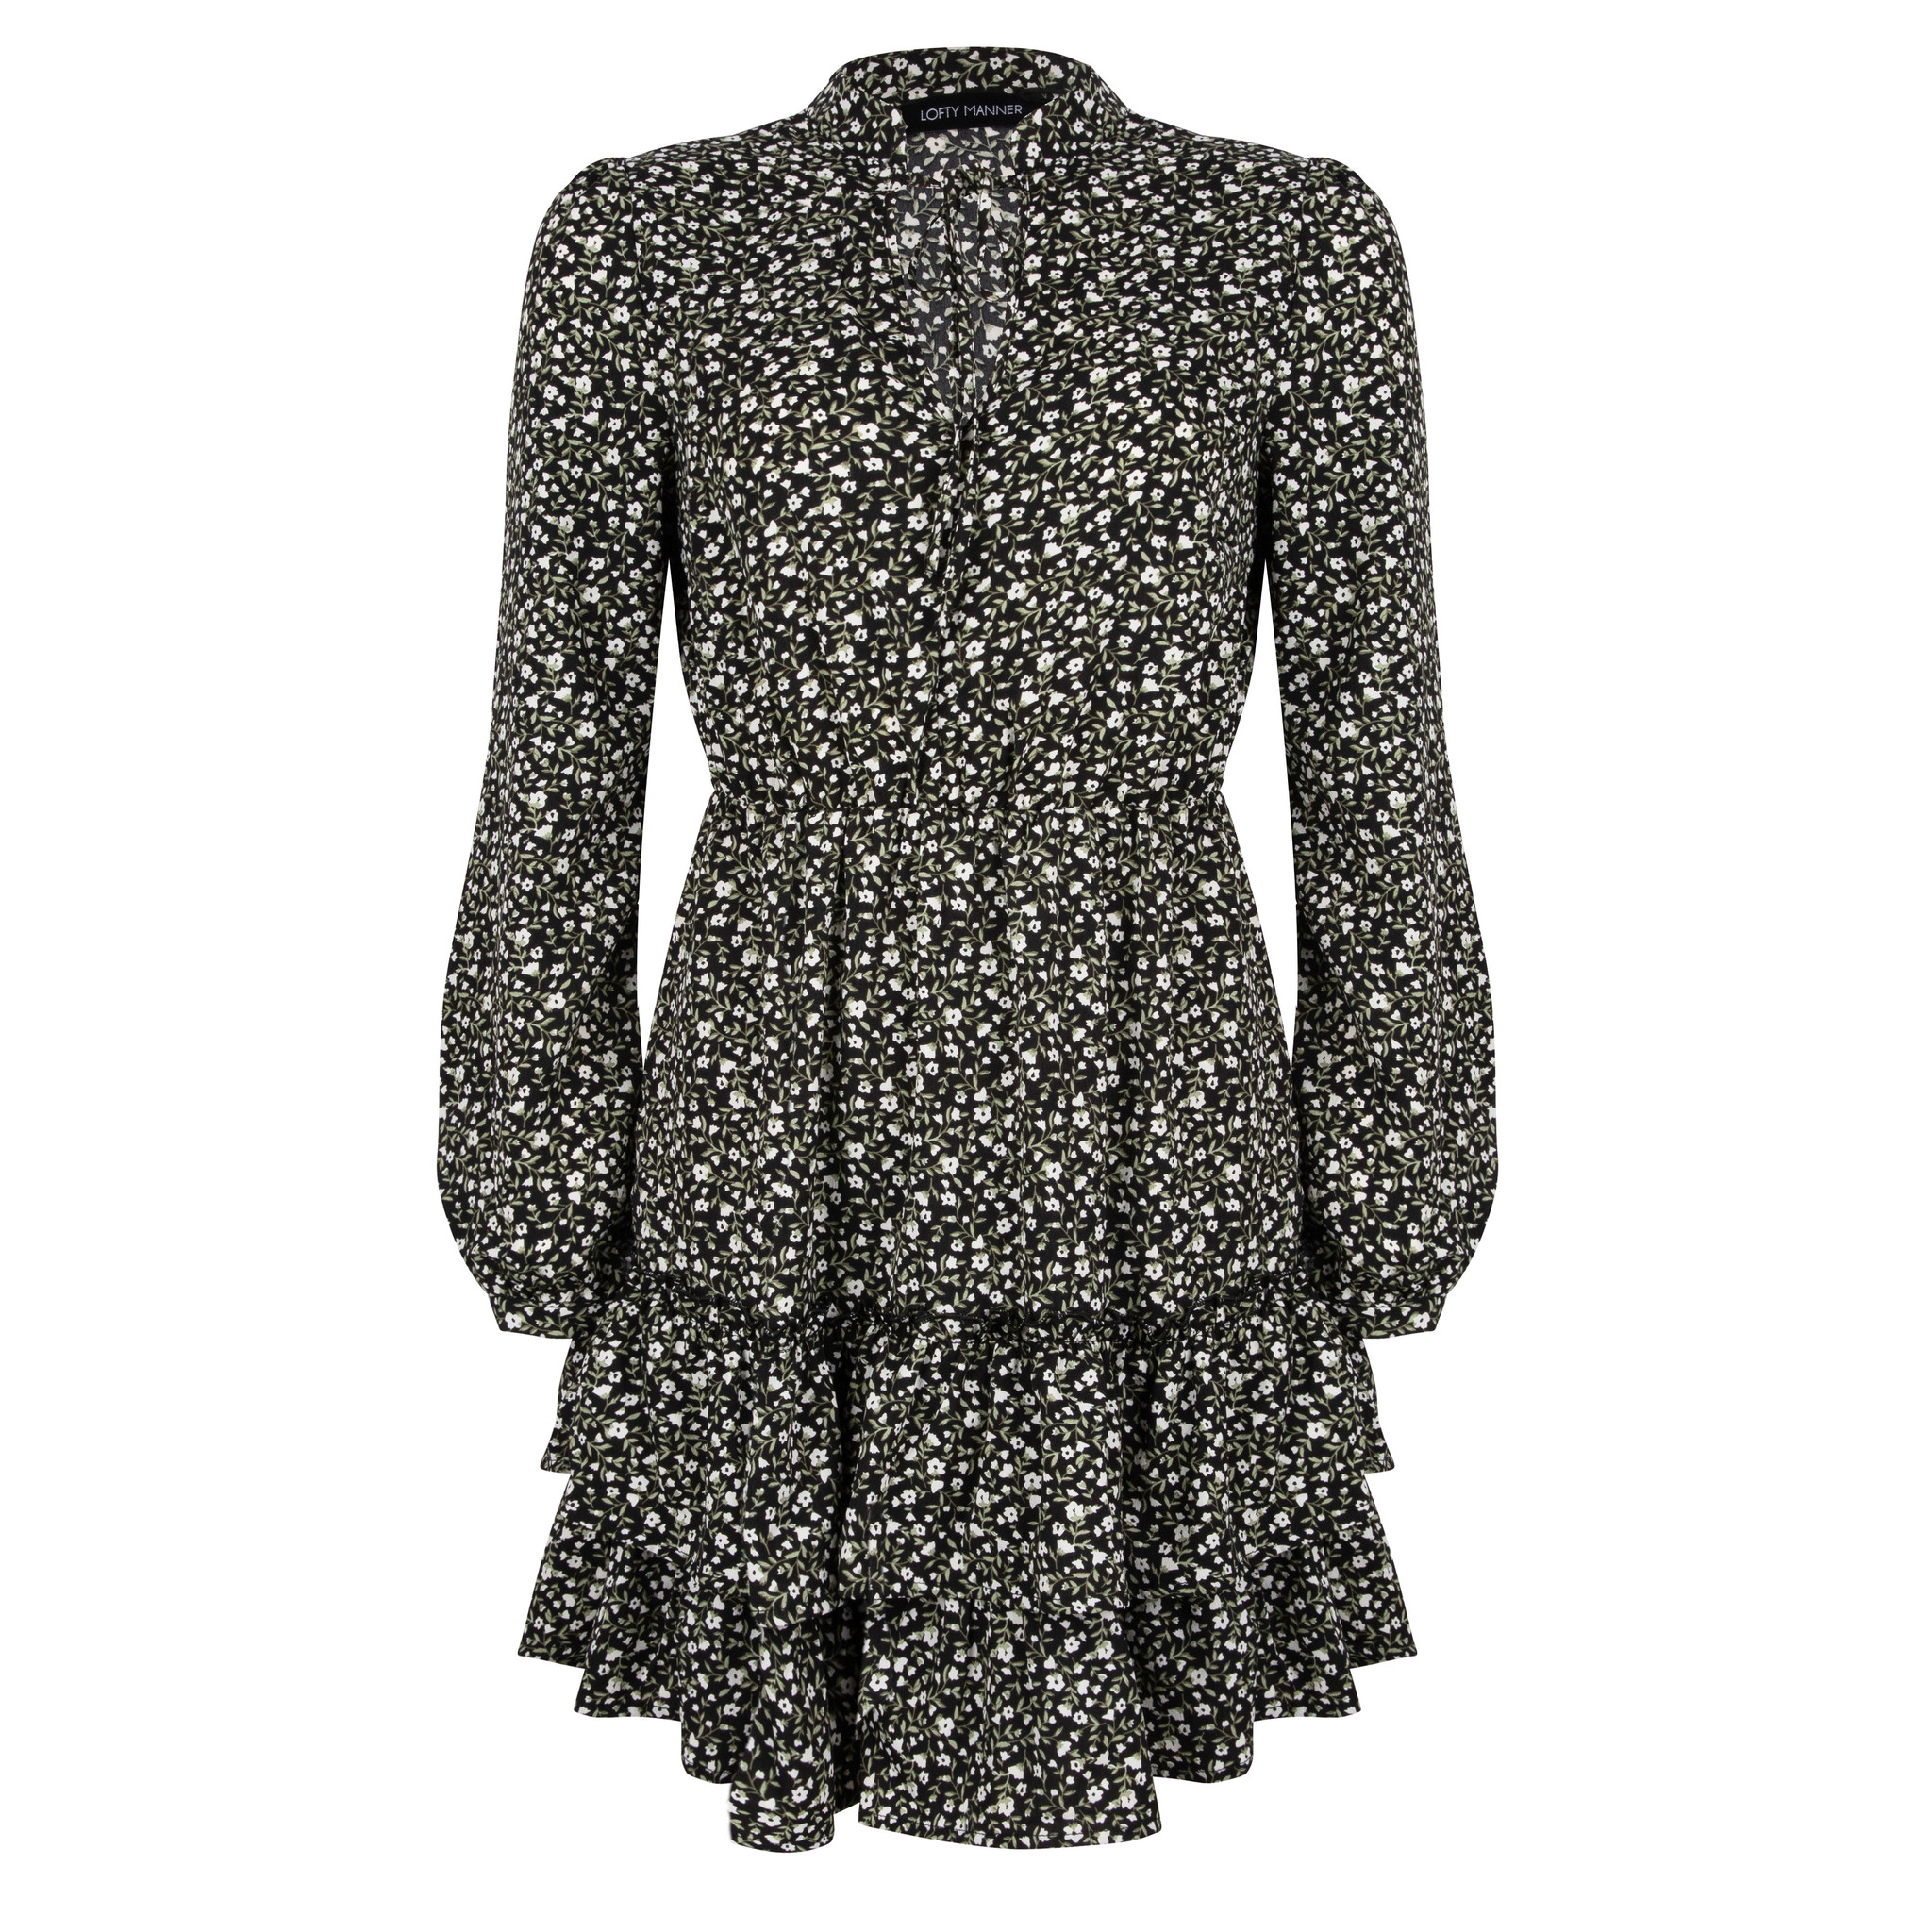 Lofty Manner Black Floral Print Dress Fayah